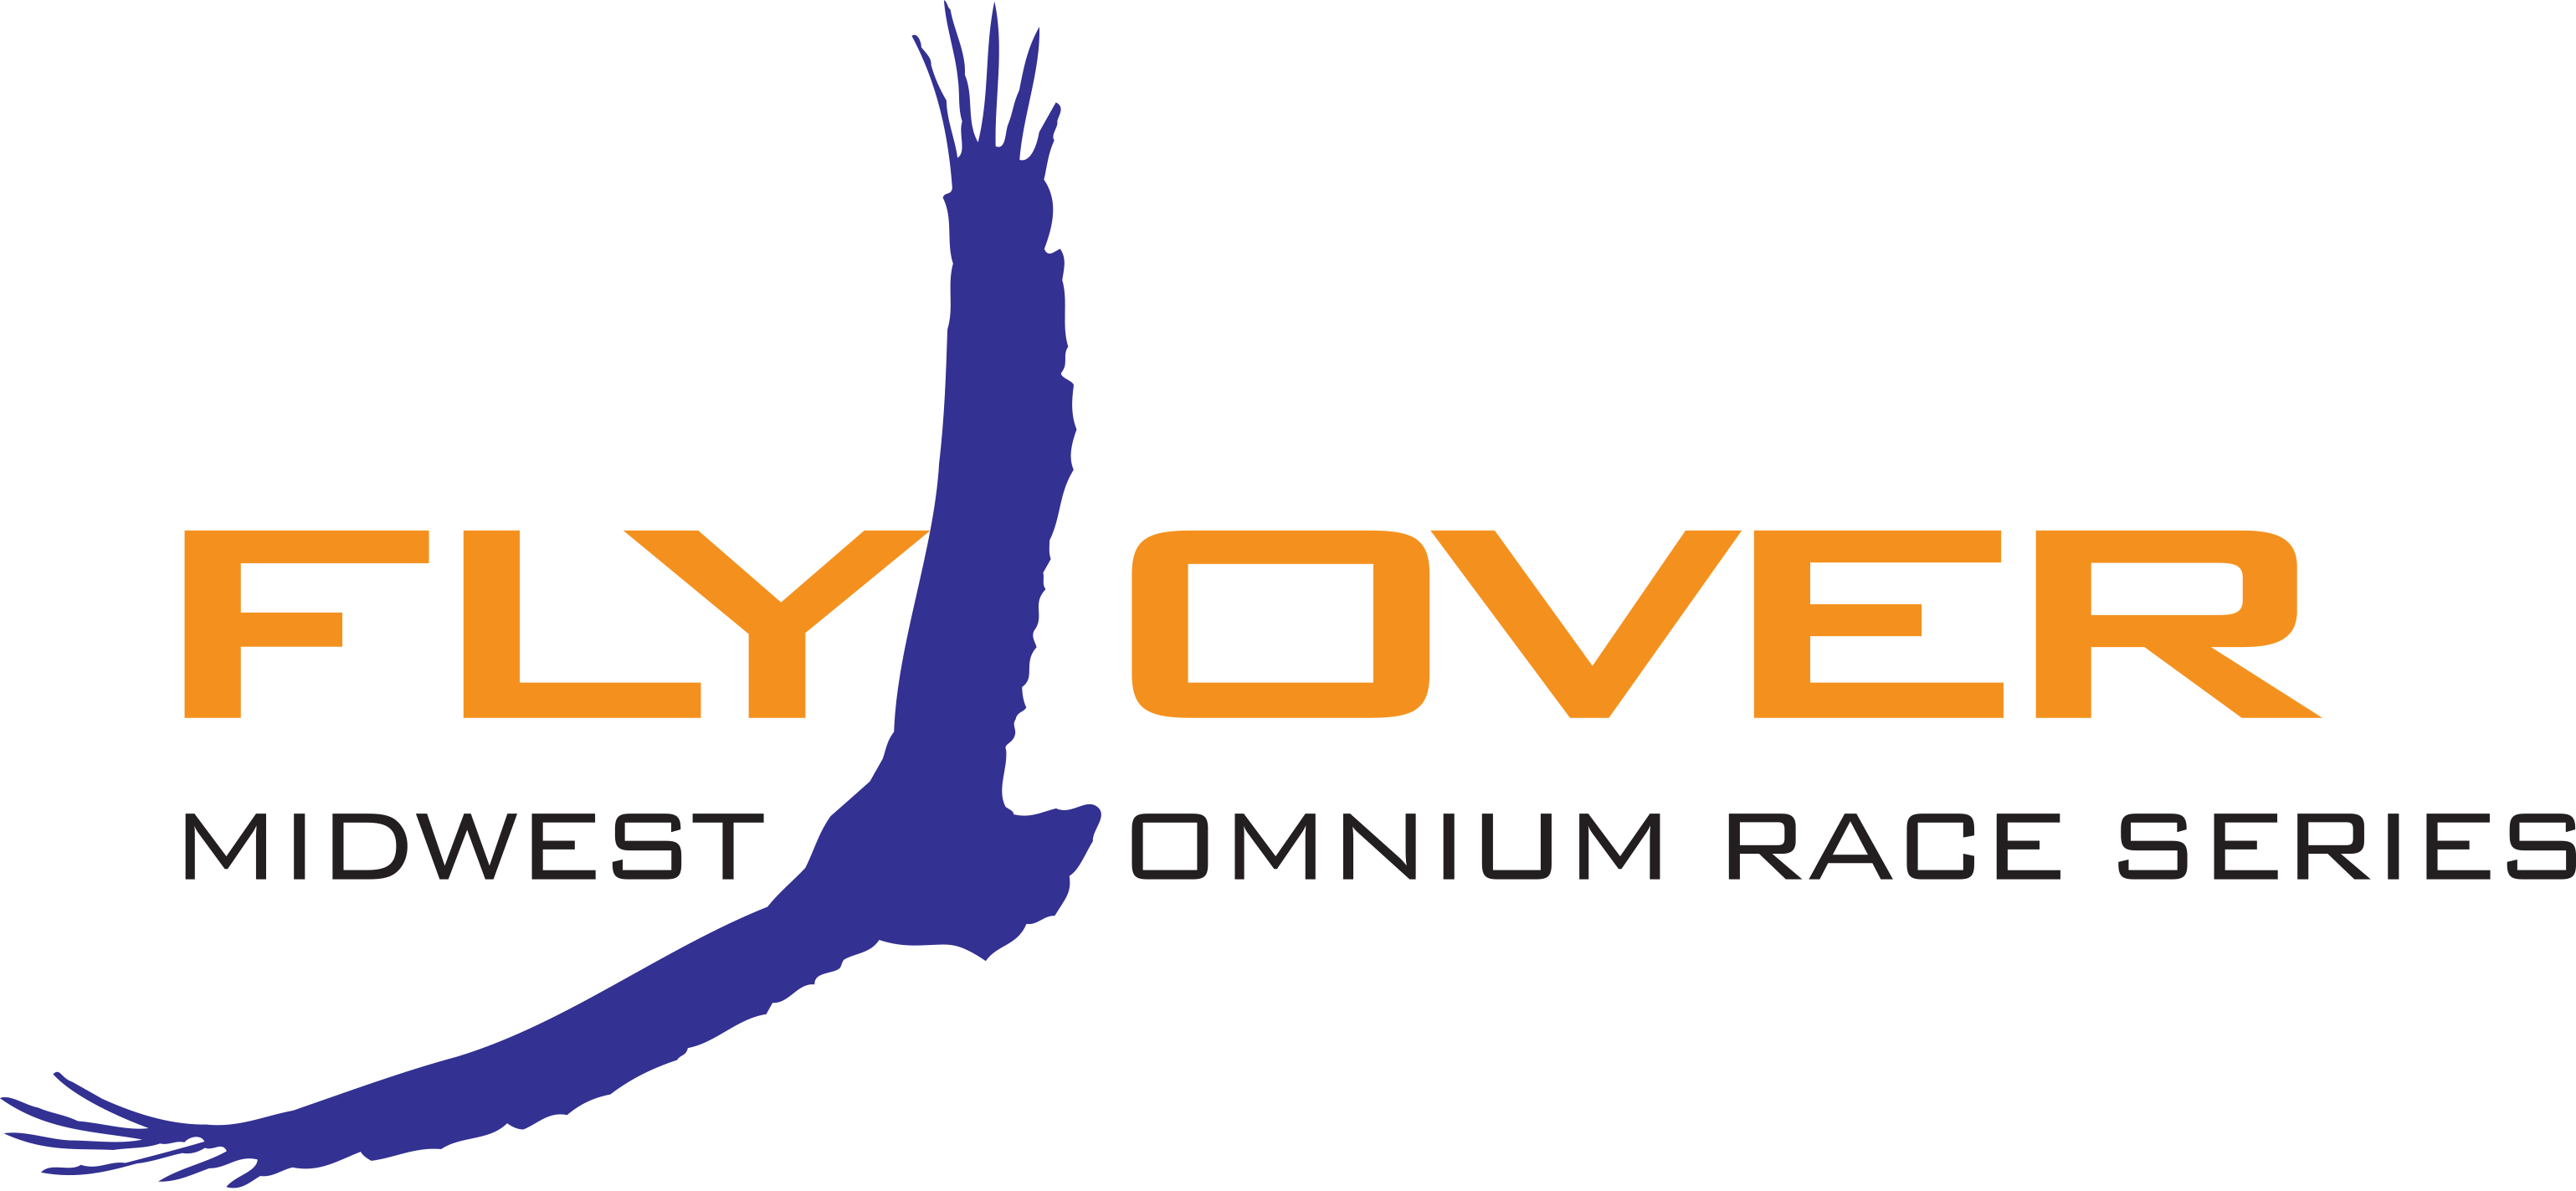 Flyover Omnium Race Series